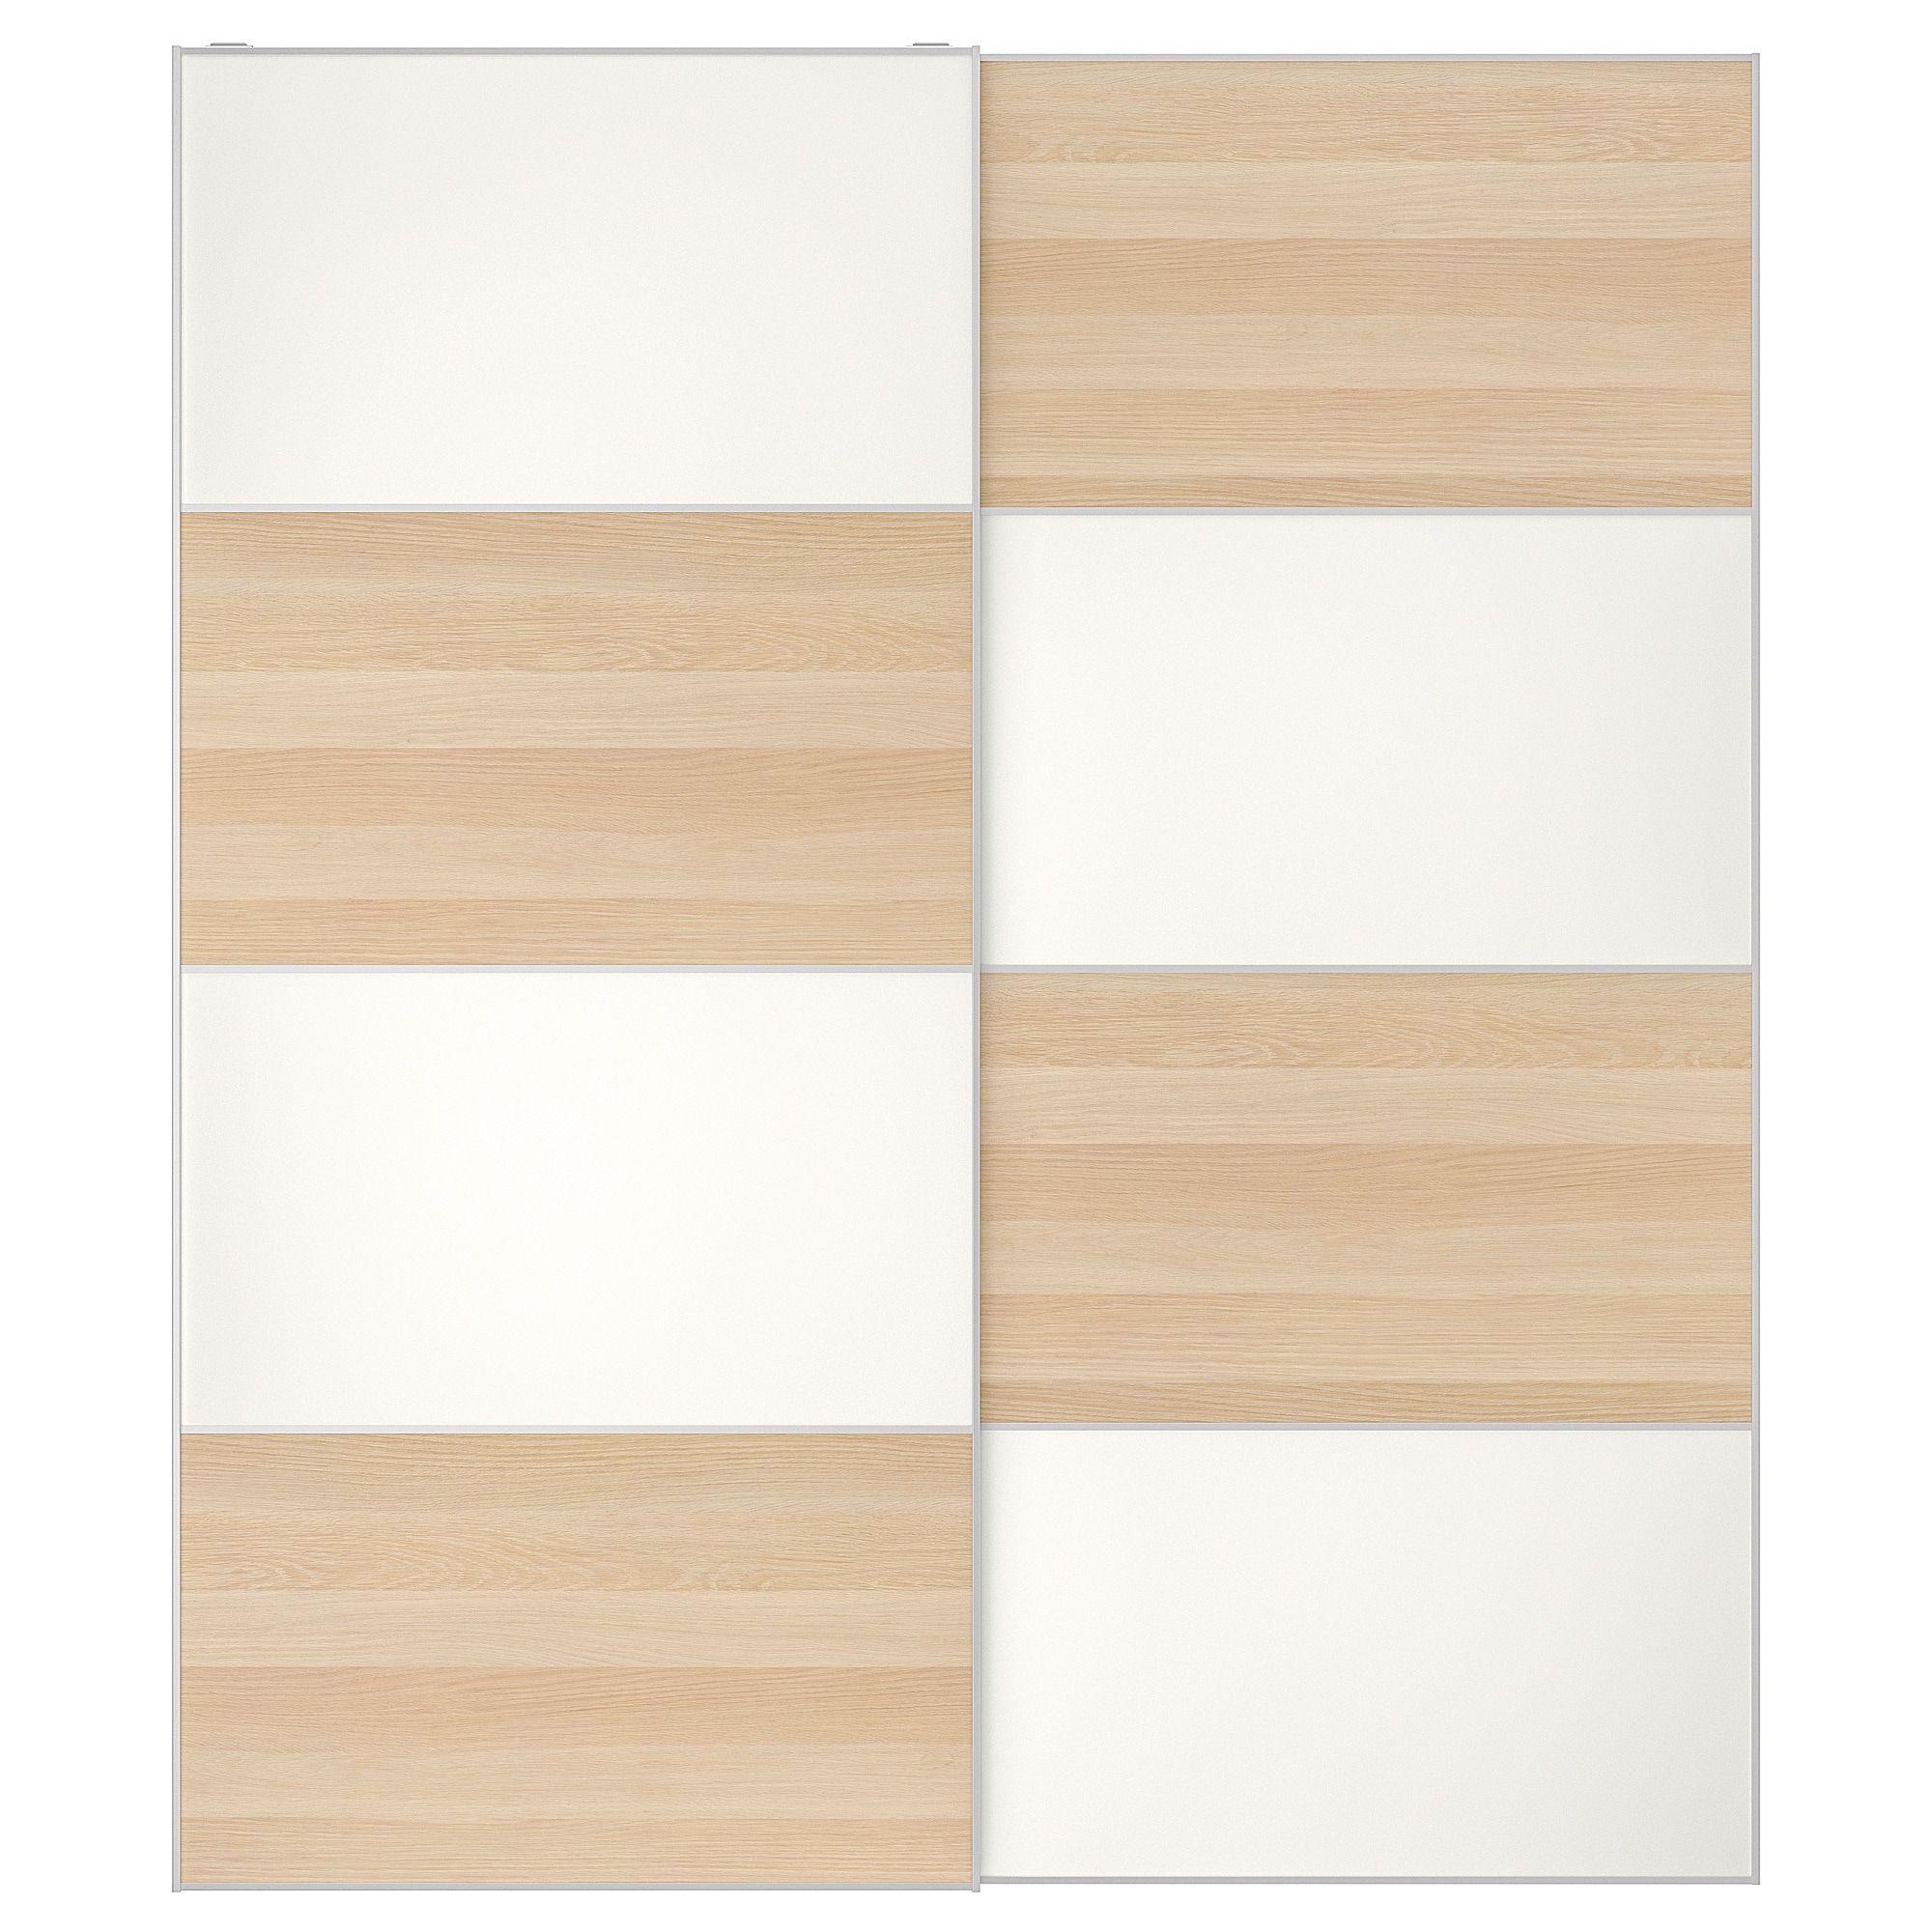 Ikea Mehamn White Stained Oak Effect White Pair Of Sliding Doors Pax System Sliding Doors Ikea